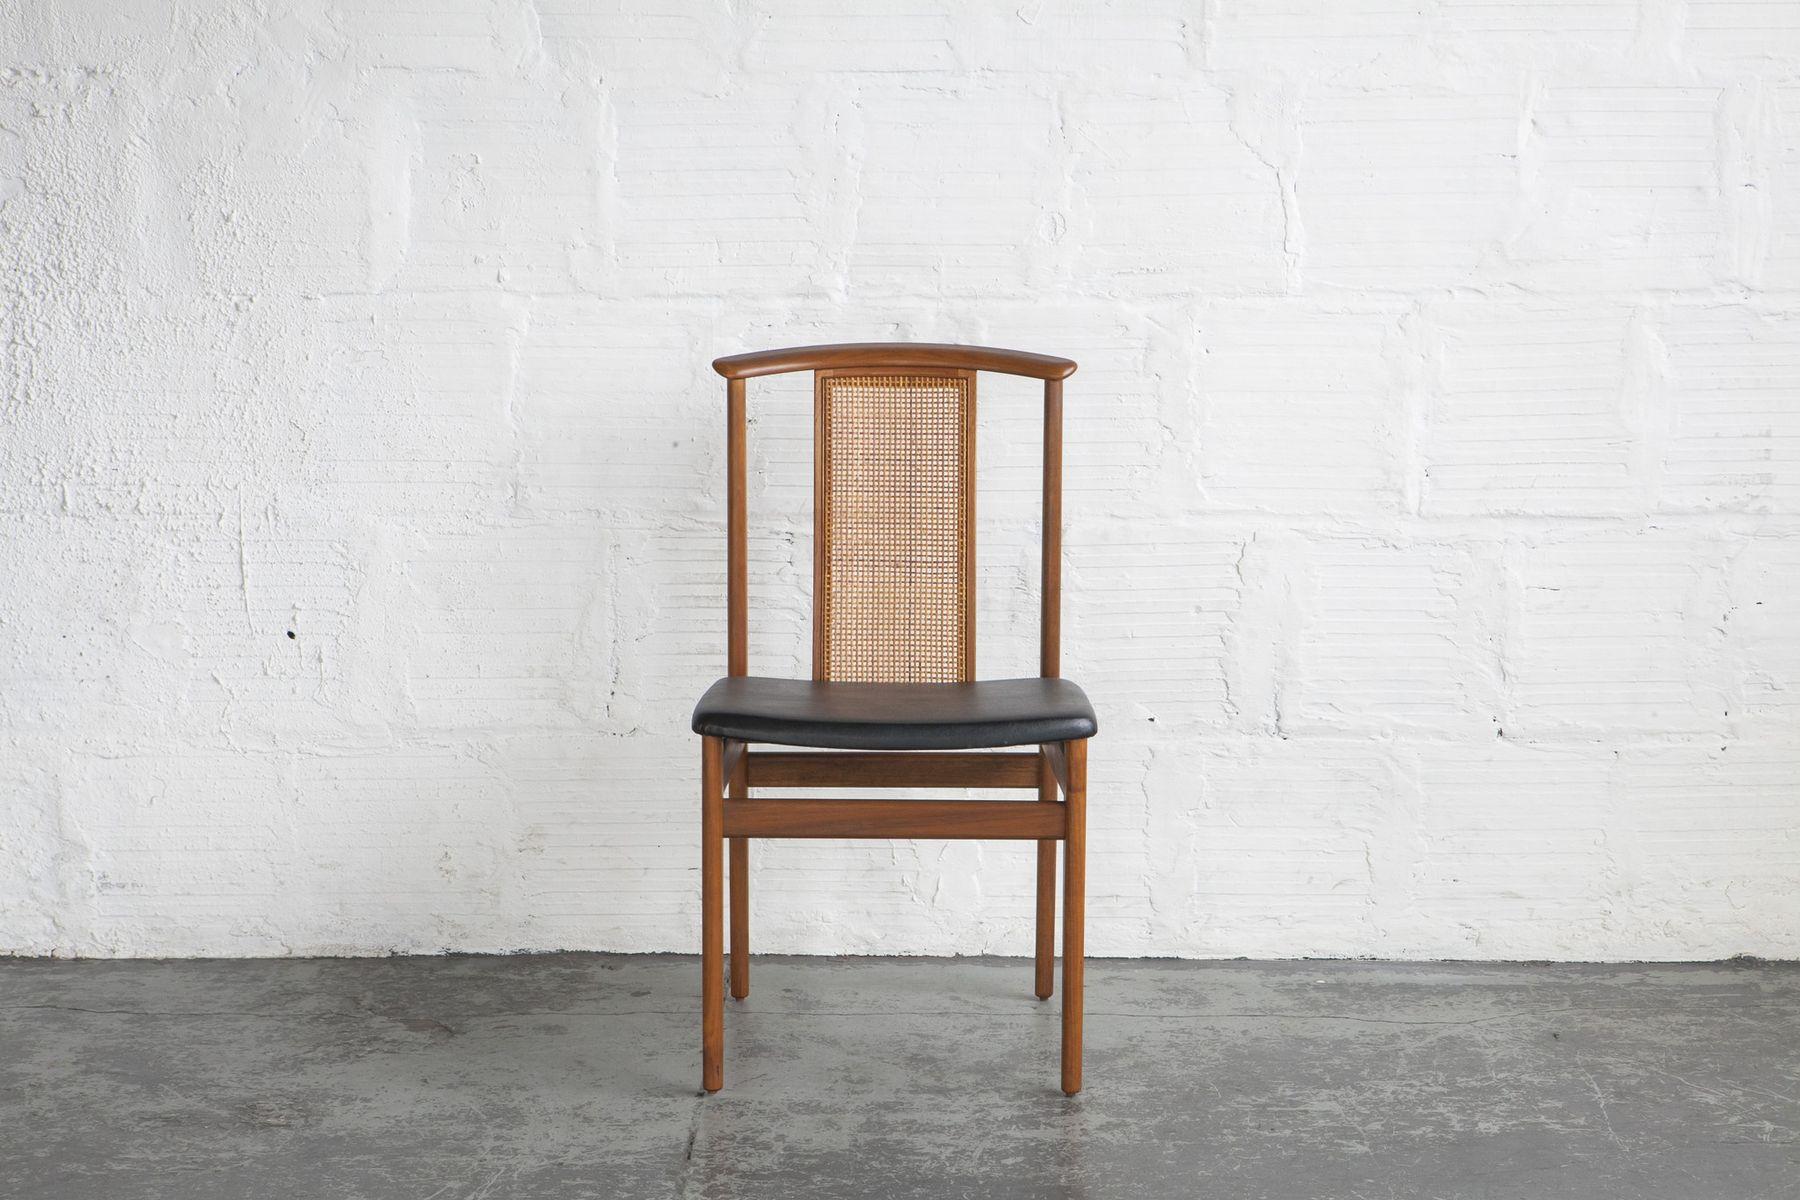 rattan esszimmerst hle von dux 1960er 6er set bei pamono. Black Bedroom Furniture Sets. Home Design Ideas